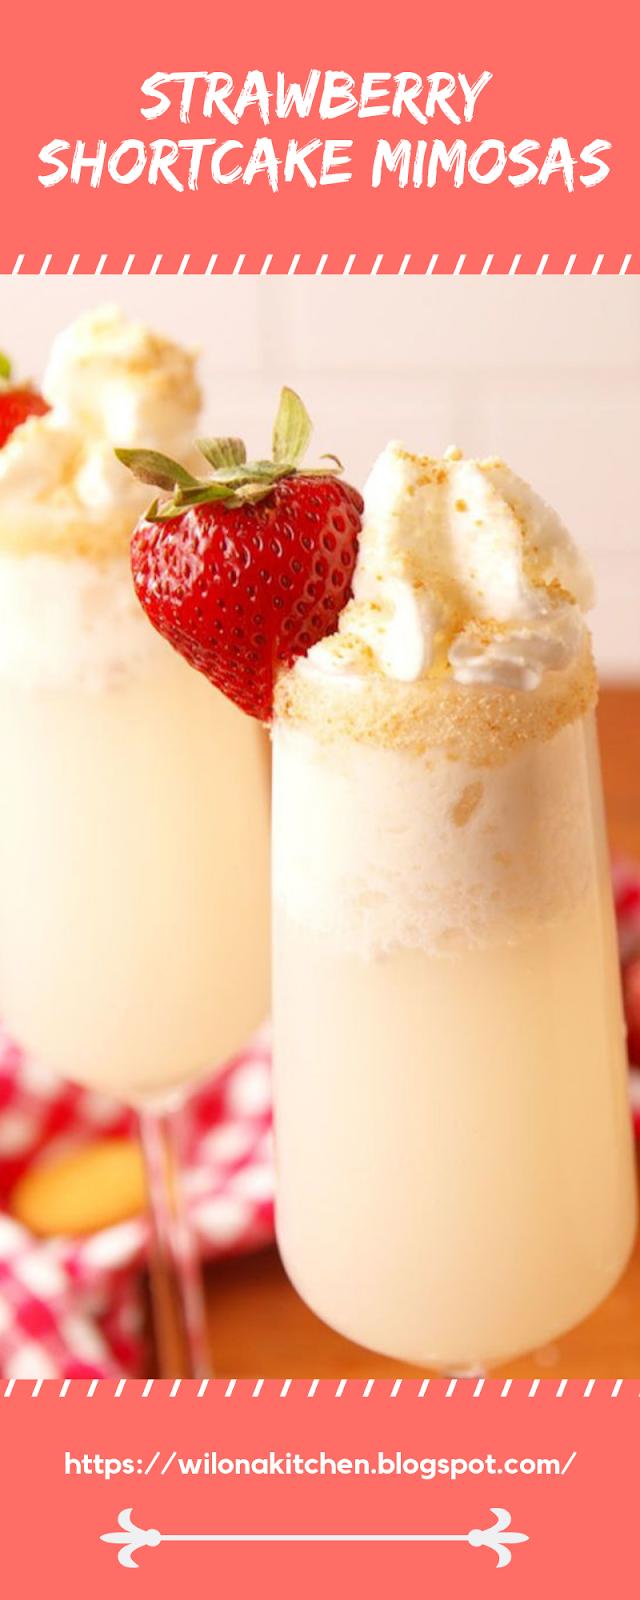 Strawberry Shortcake Mimosas